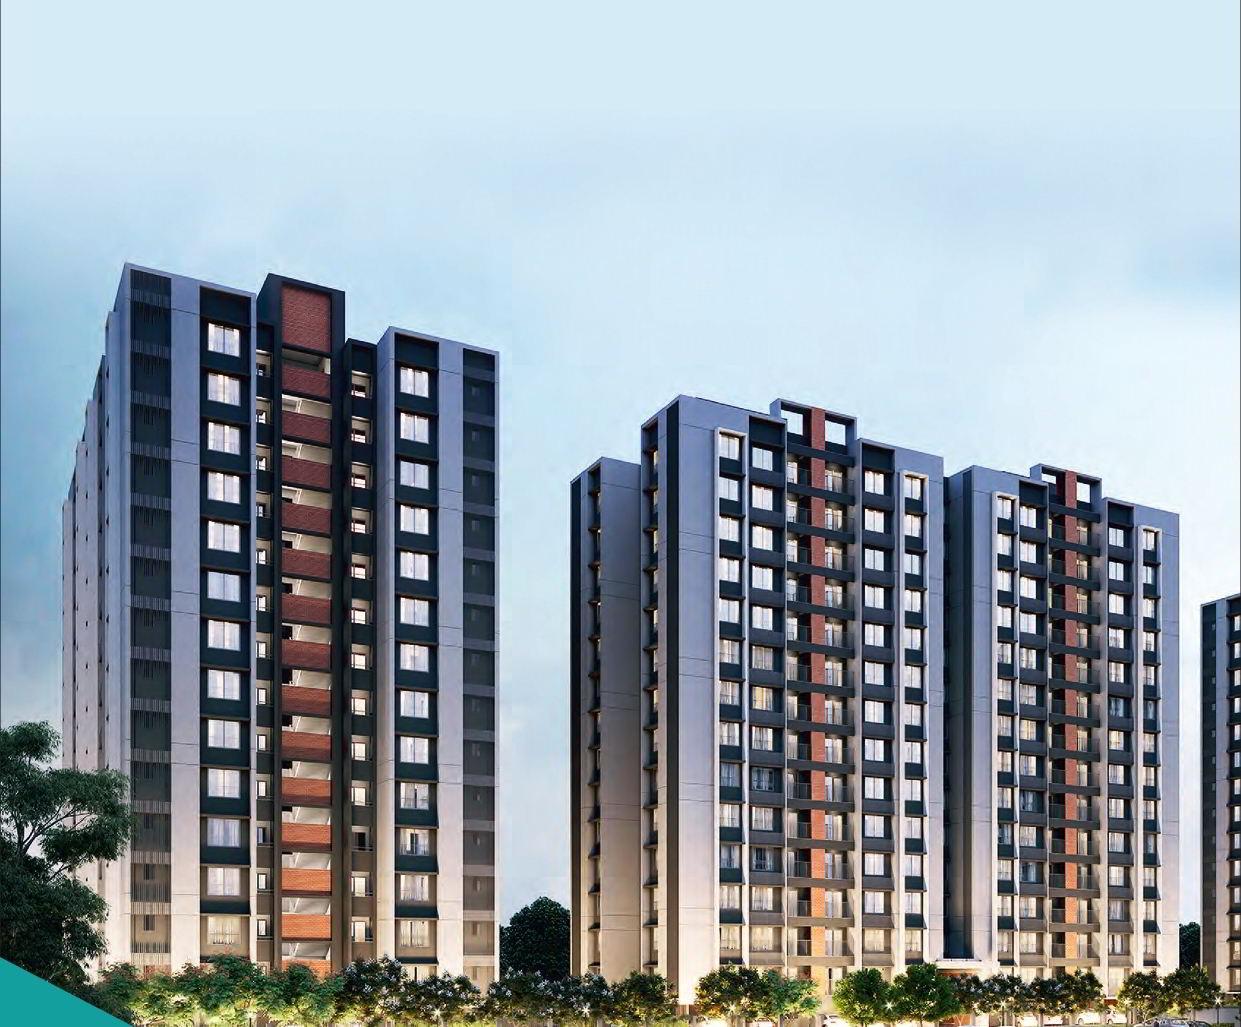 2 & 3 BHK Flat For Sale In Adani Amogha Vaishnodevi Ahmedabad.